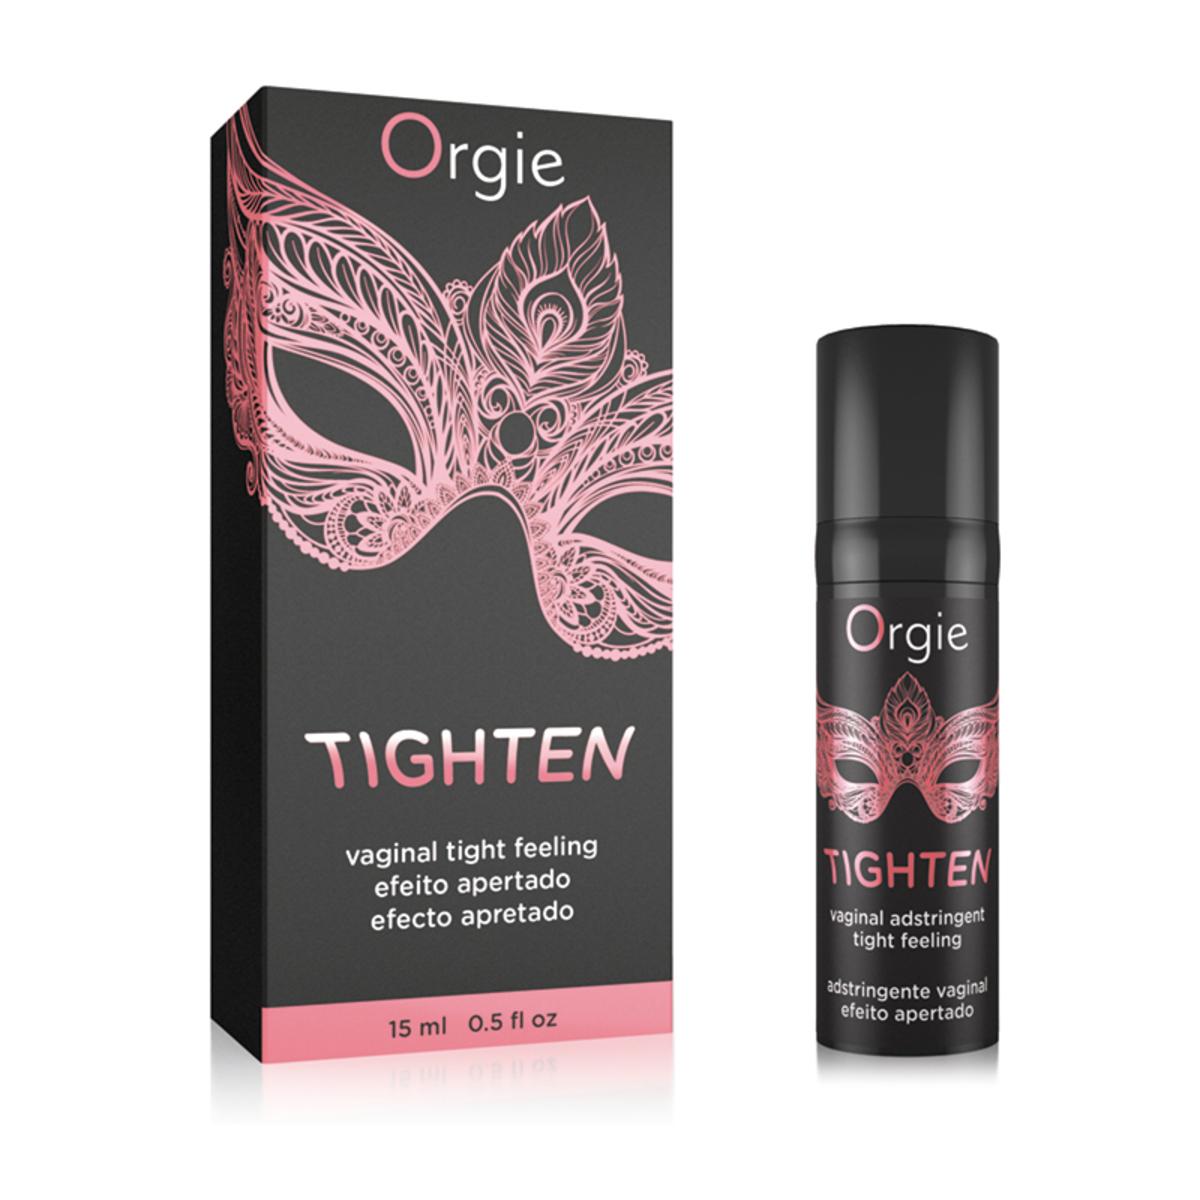 Orgie - TIGHTEN - 15ml